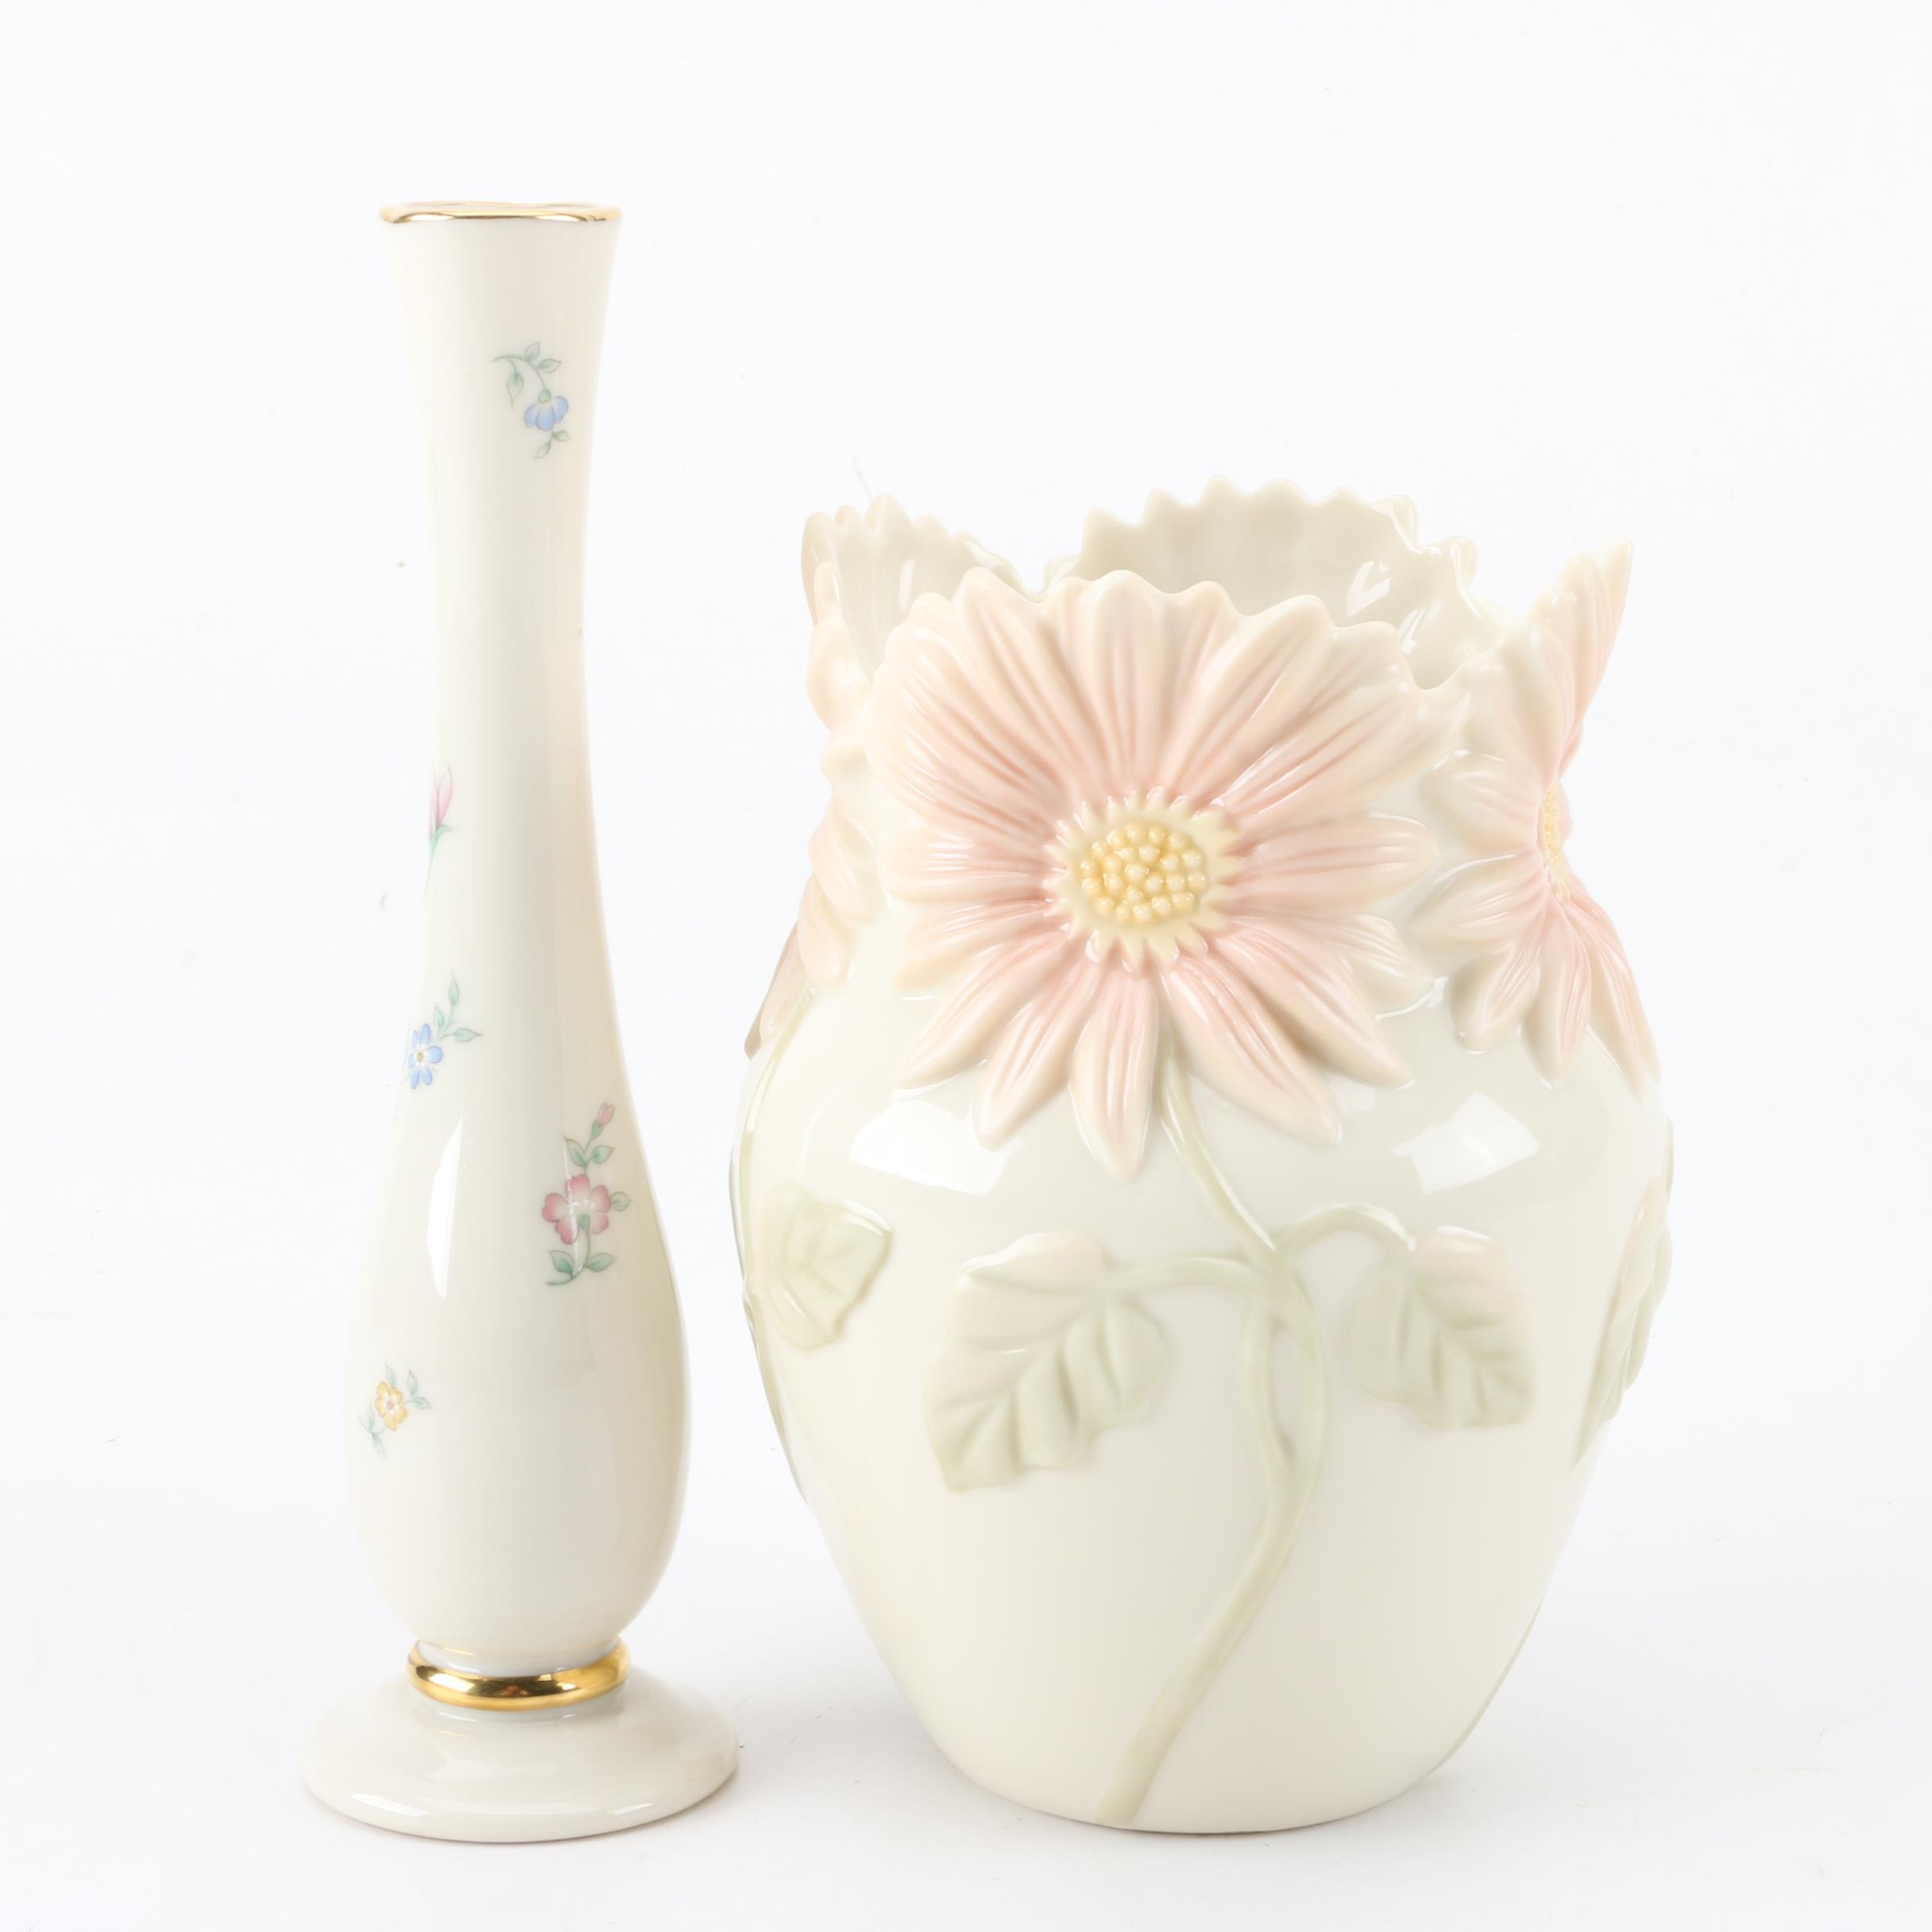 Vases by Lenox